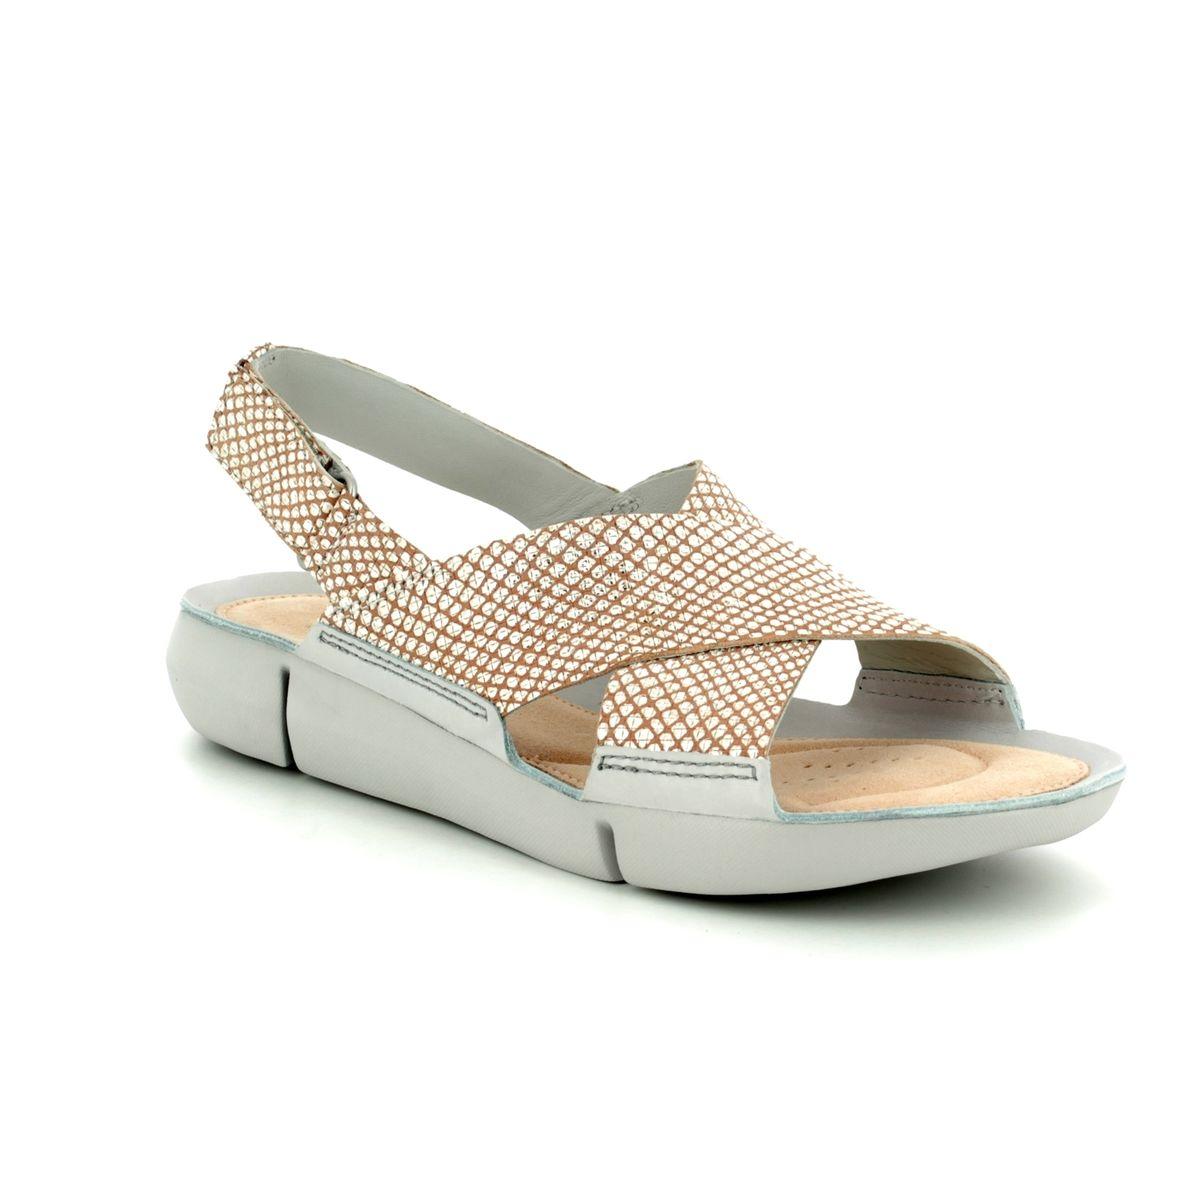 161e3c5c3d90 Clarks Sandals - Silver multi - 3129 44D TRI CHLOE